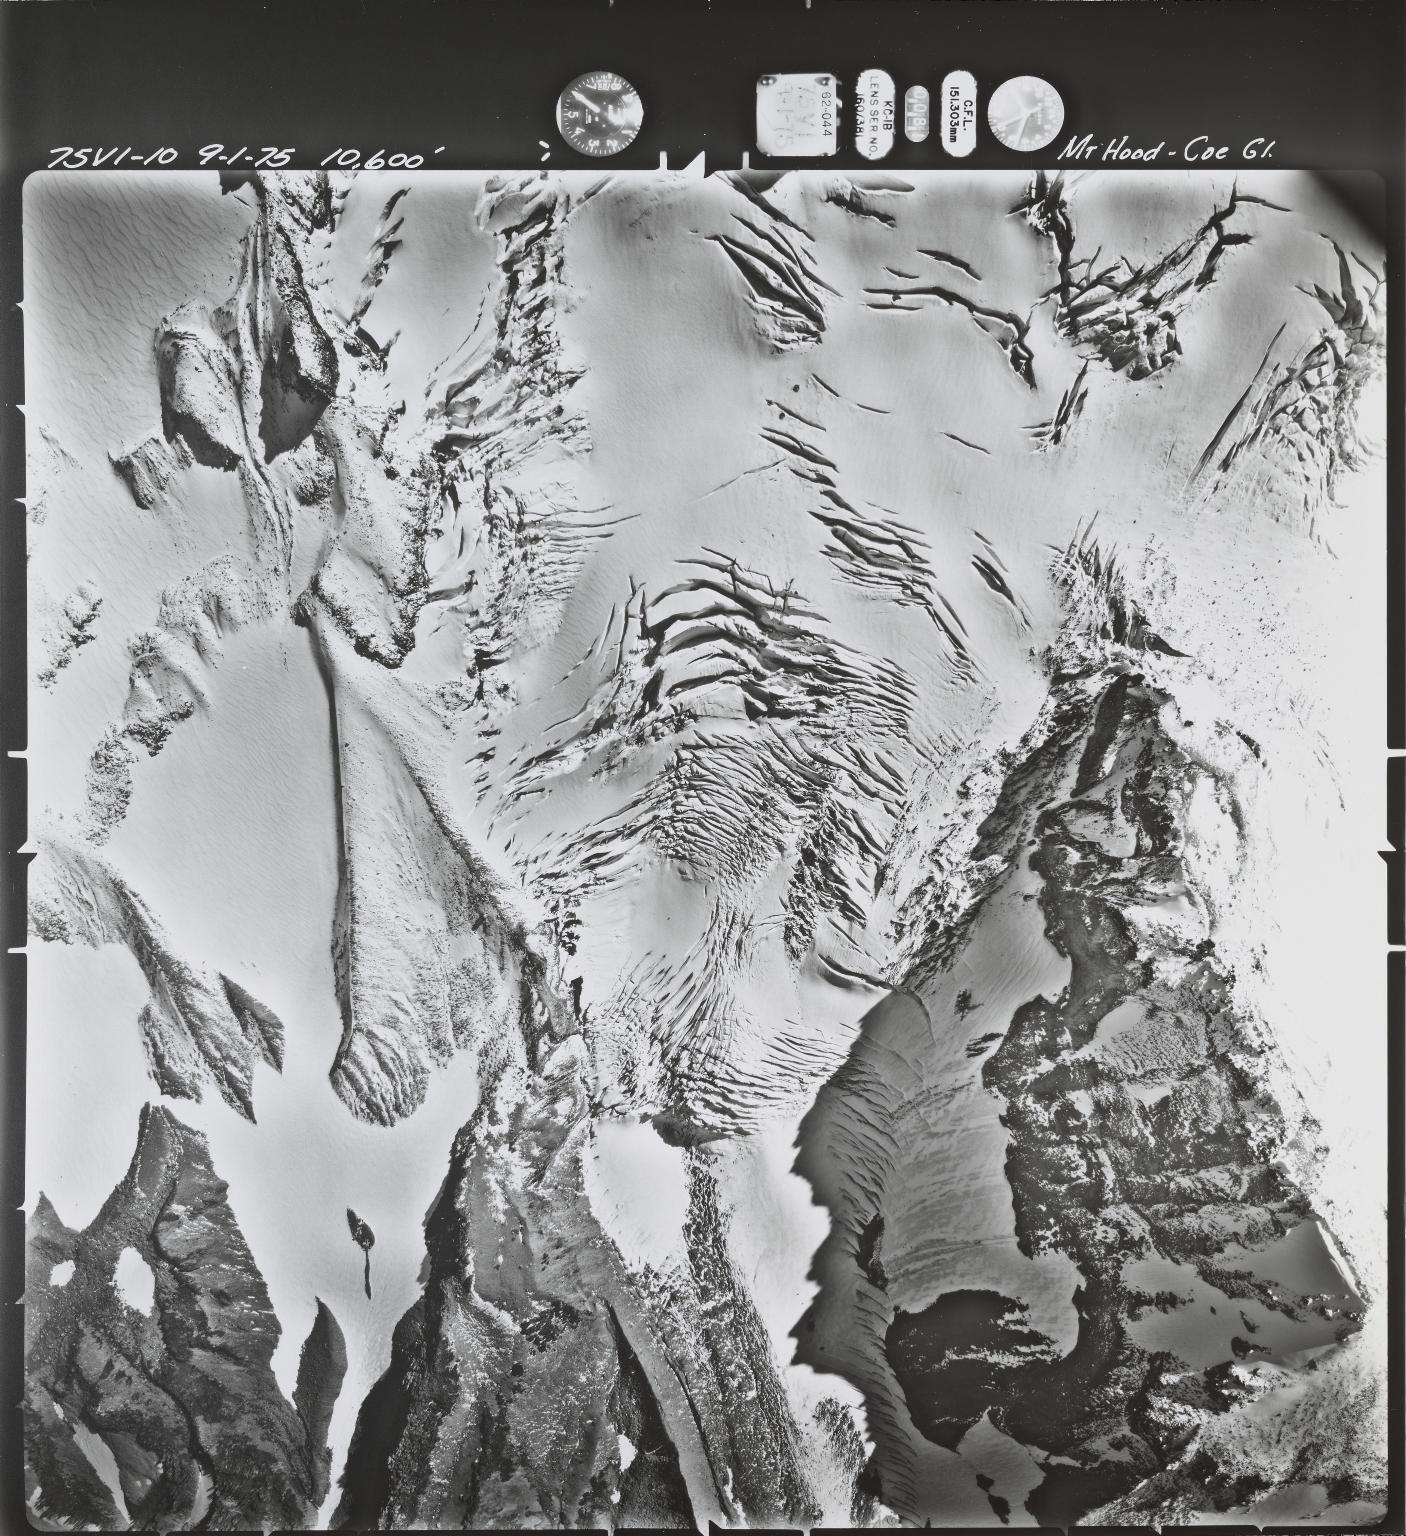 Coe Glacier near Mount Hood, Oregon